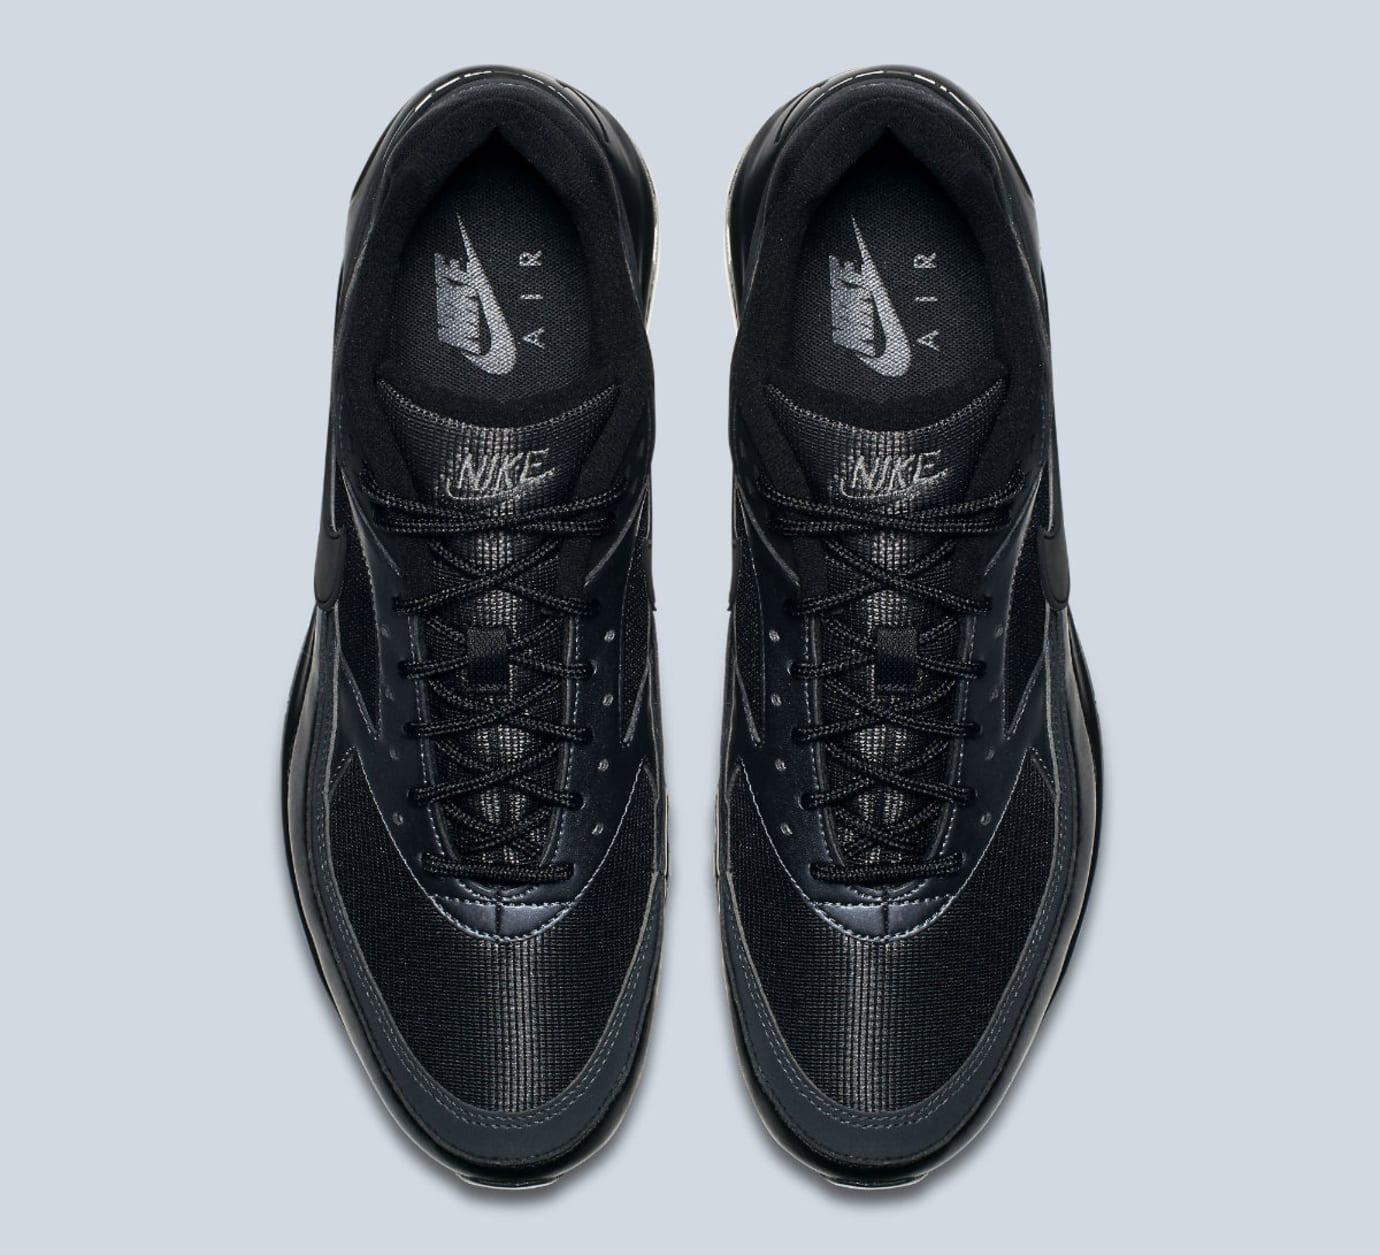 Nike Air Max 97/BW Black Release Date AO2406-001 Top